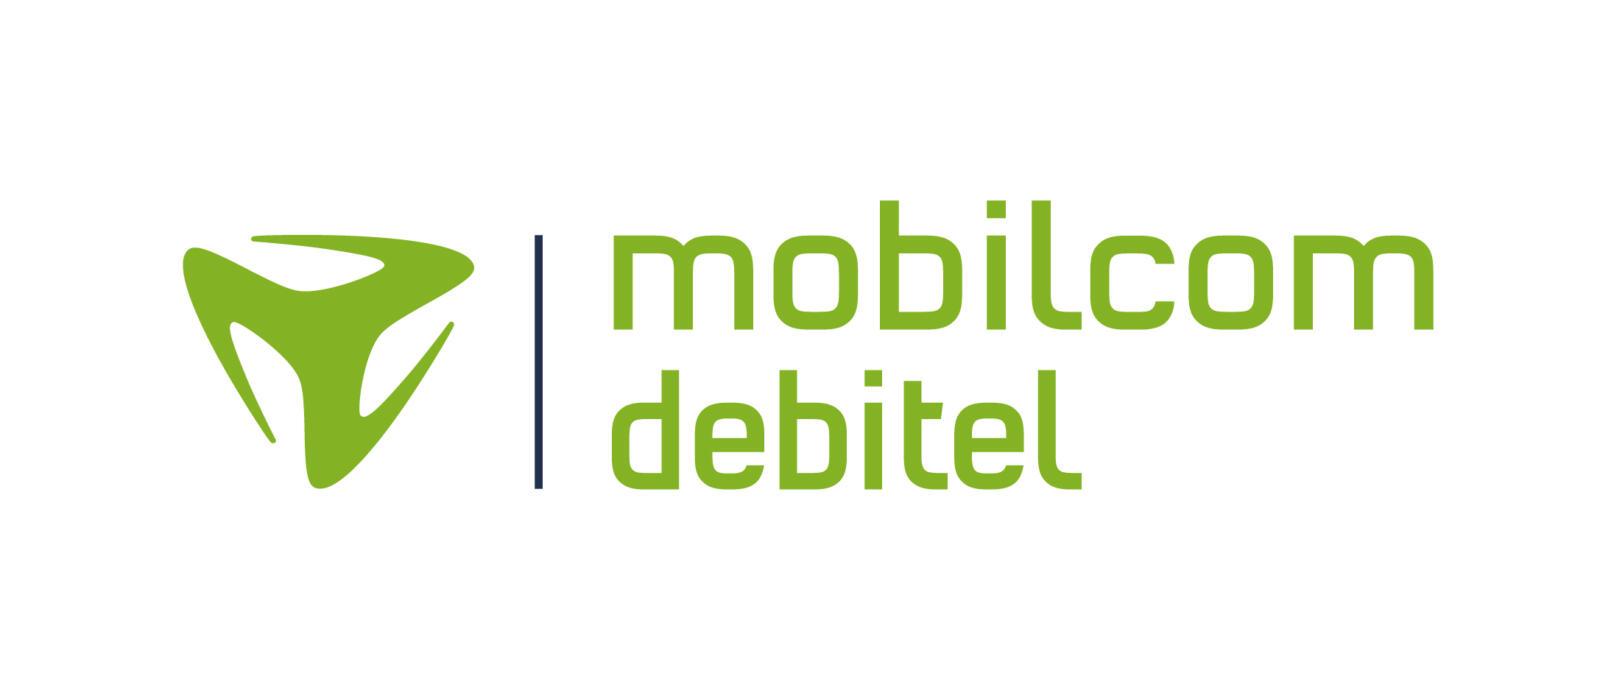 Android debitel games mobilcom